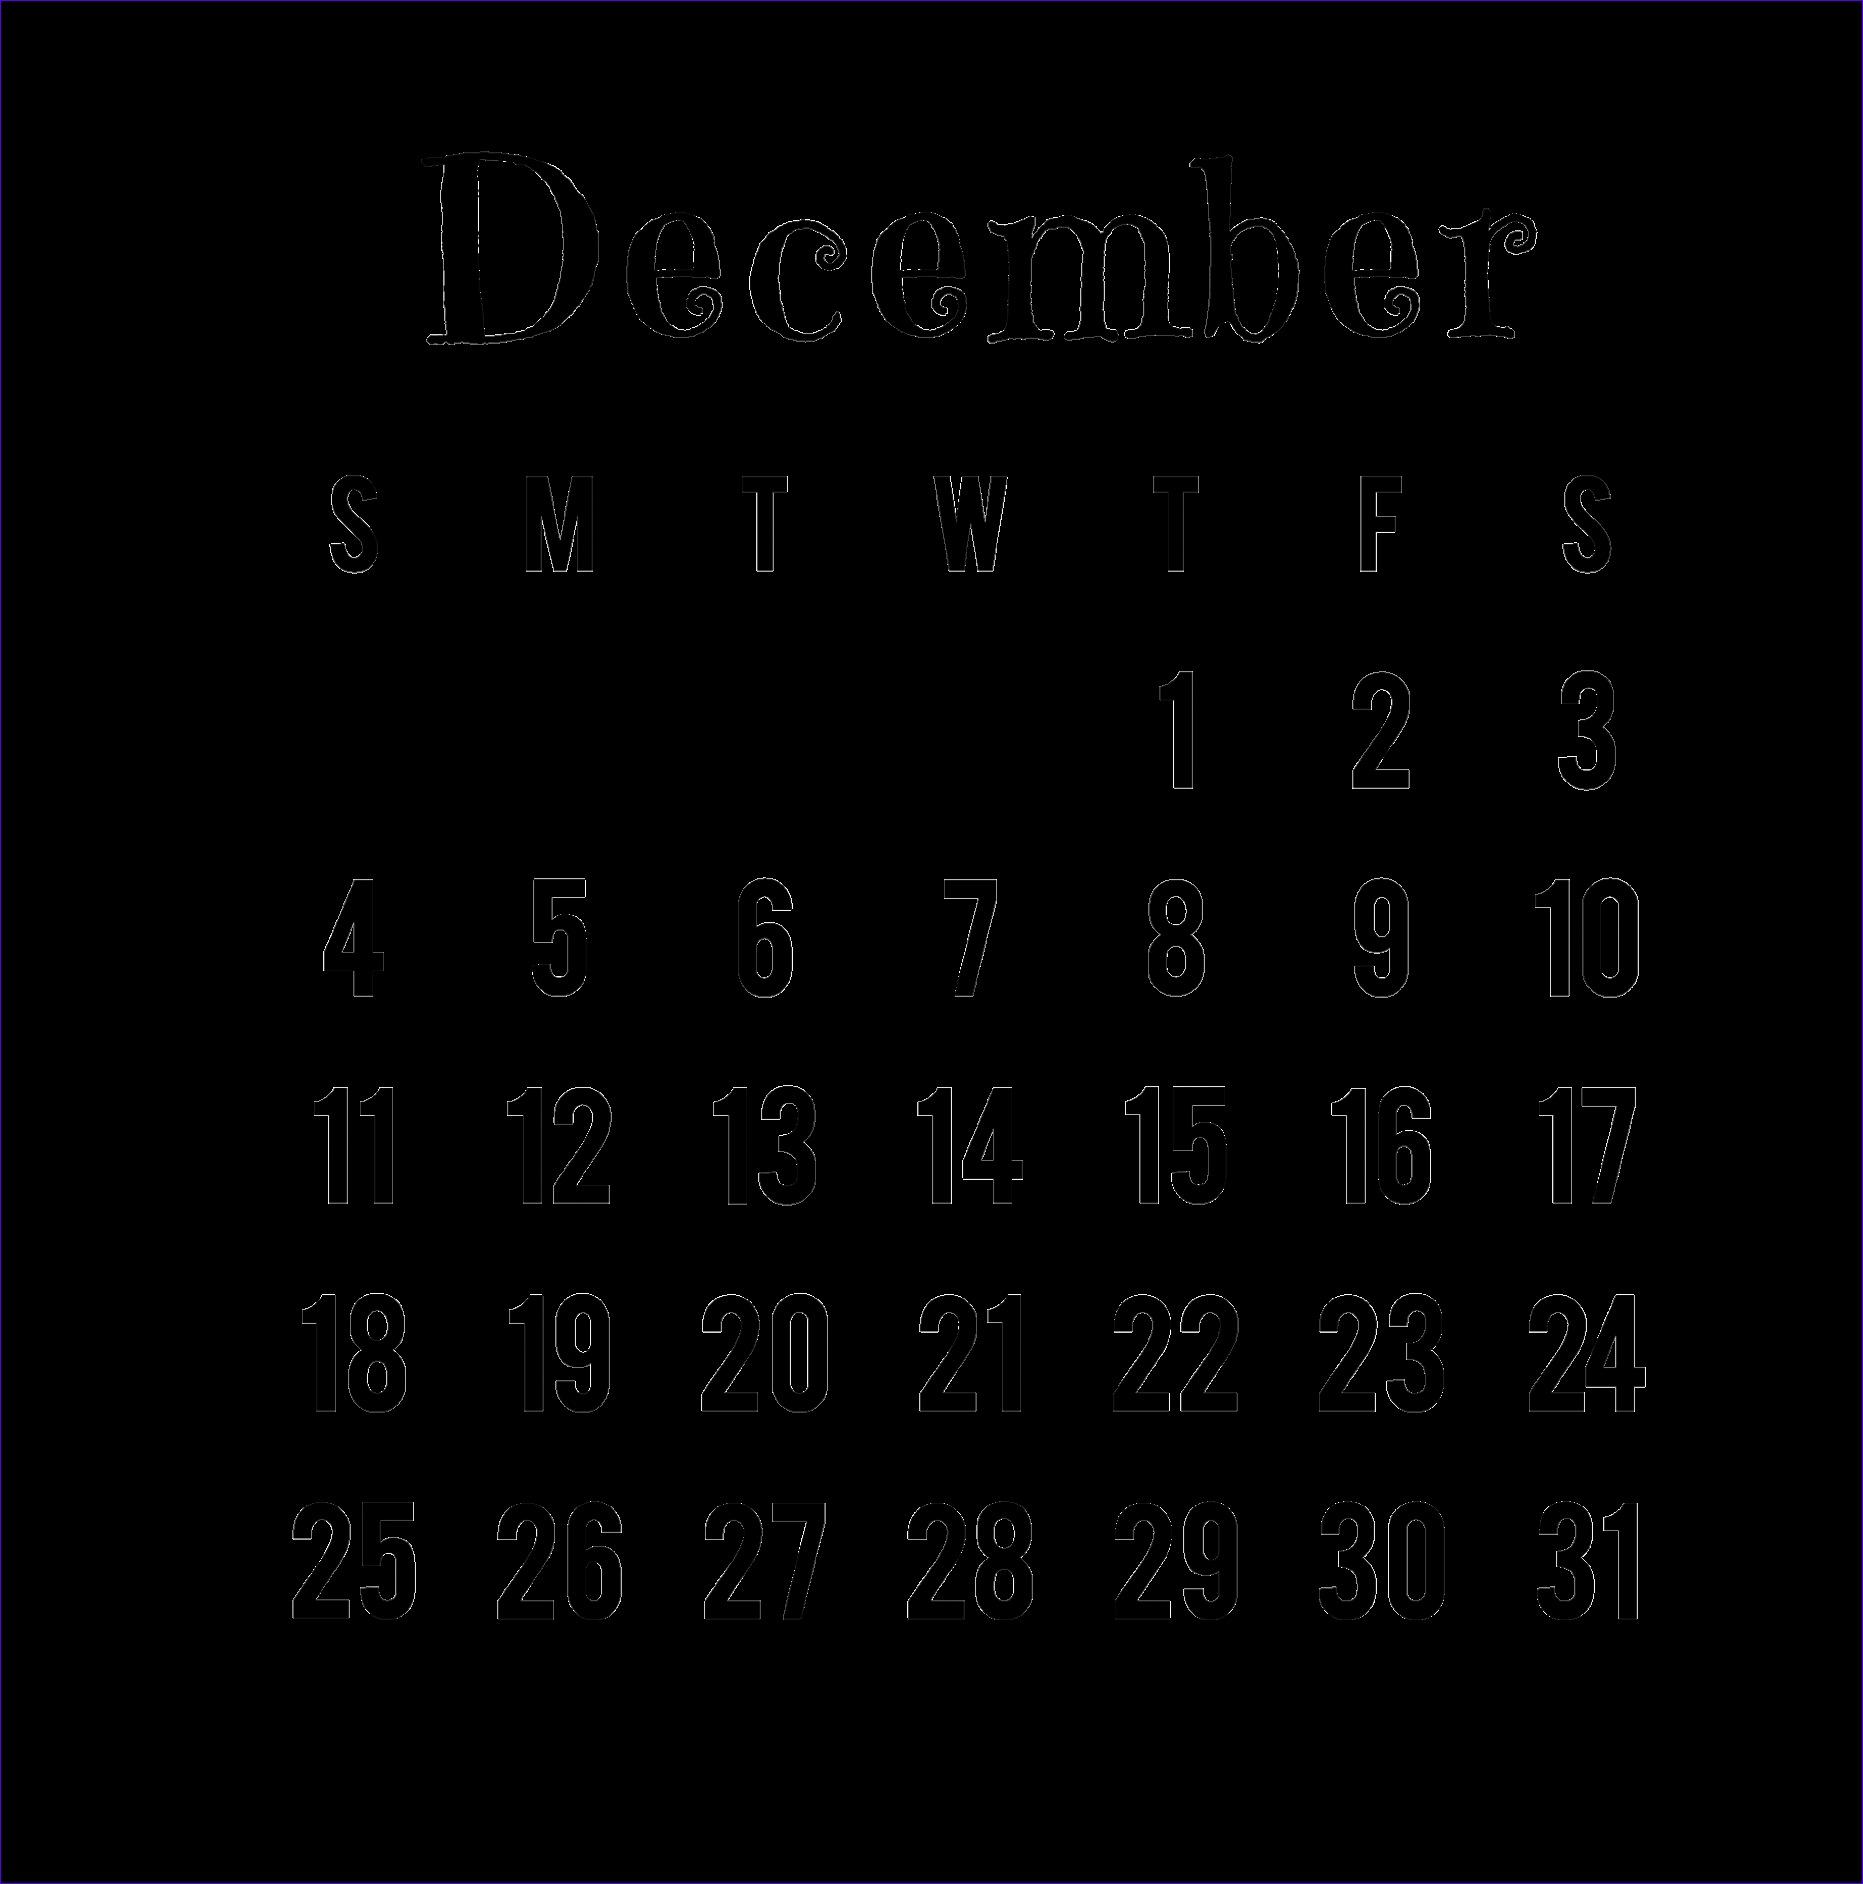 december 2016 calendar png 18631884